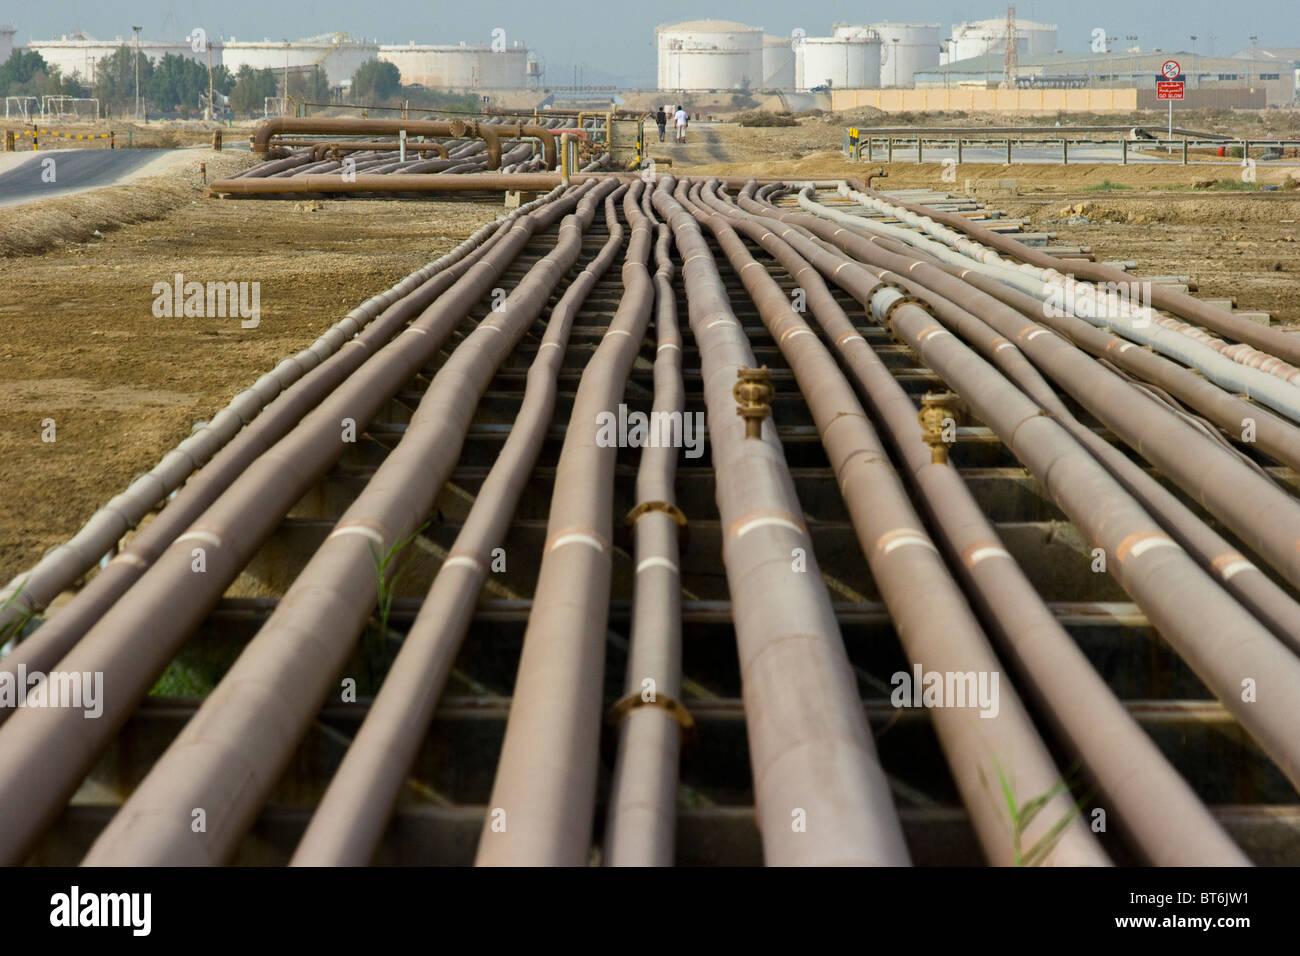 Oil pipelines in Bahrain - Stock Image